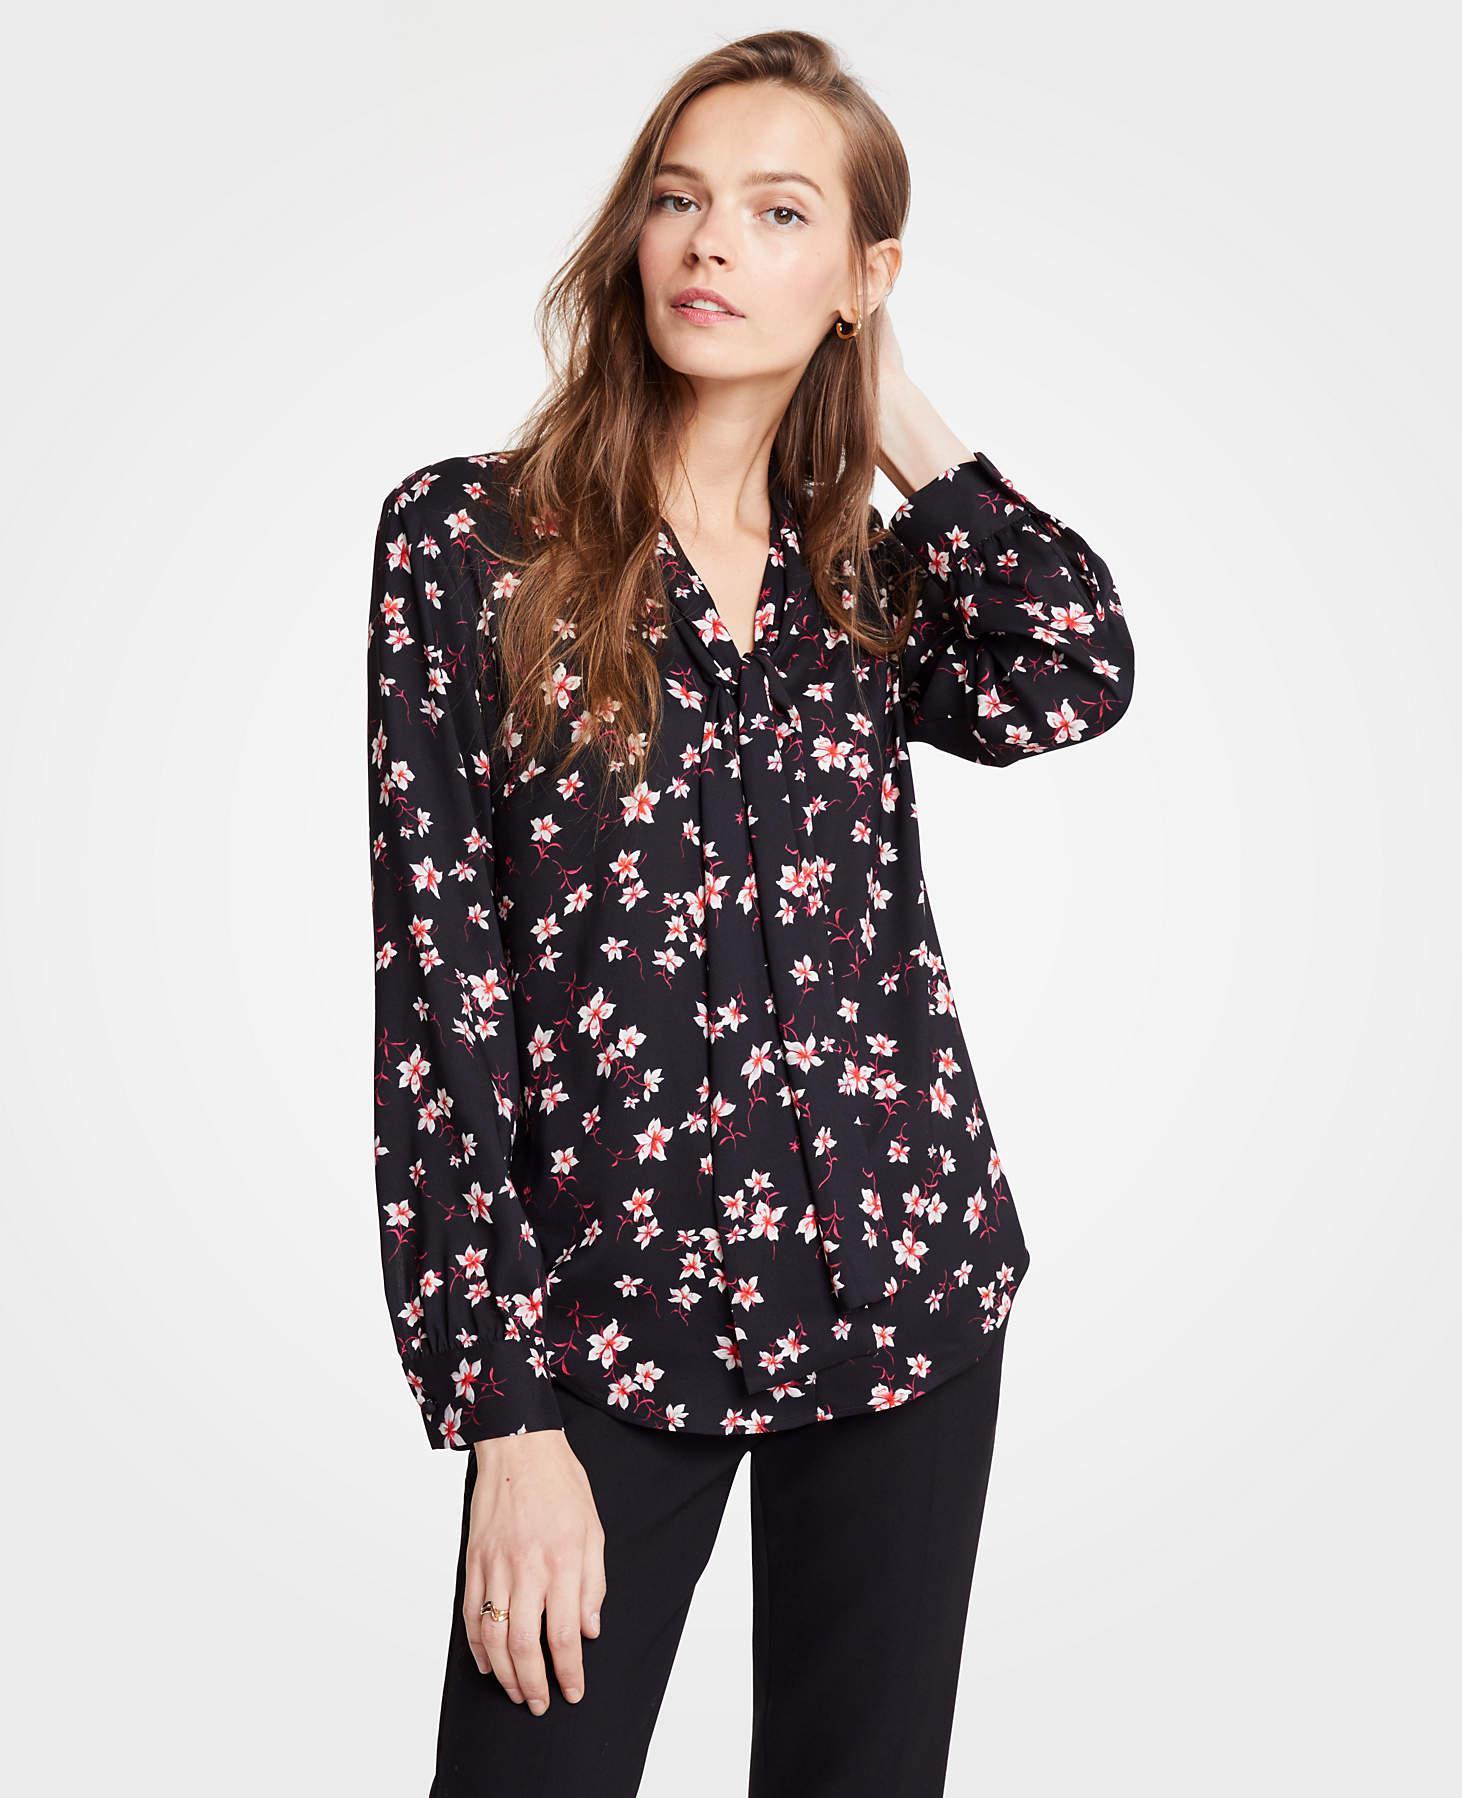 992de62e79125 Lyst - Ann Taylor Petite Romantic Flower V-neck Bow Blouse in Black